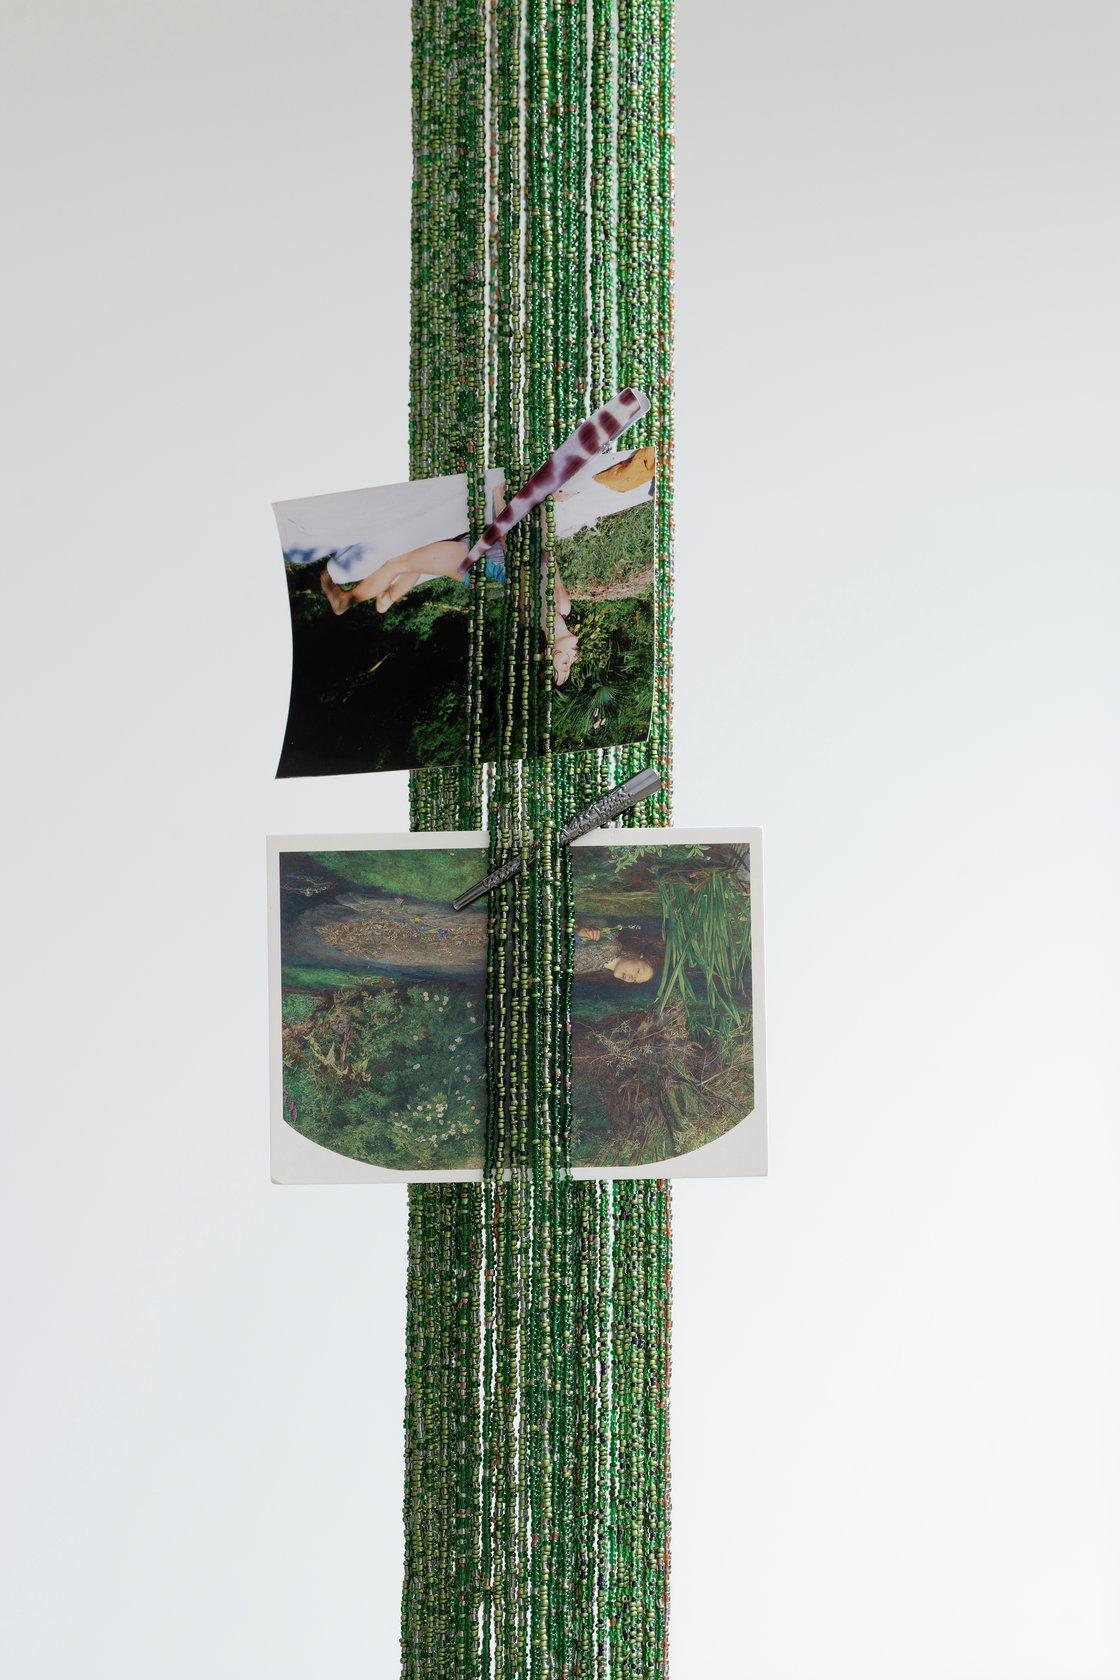 Mimosa Echard, Sap 4, 2021